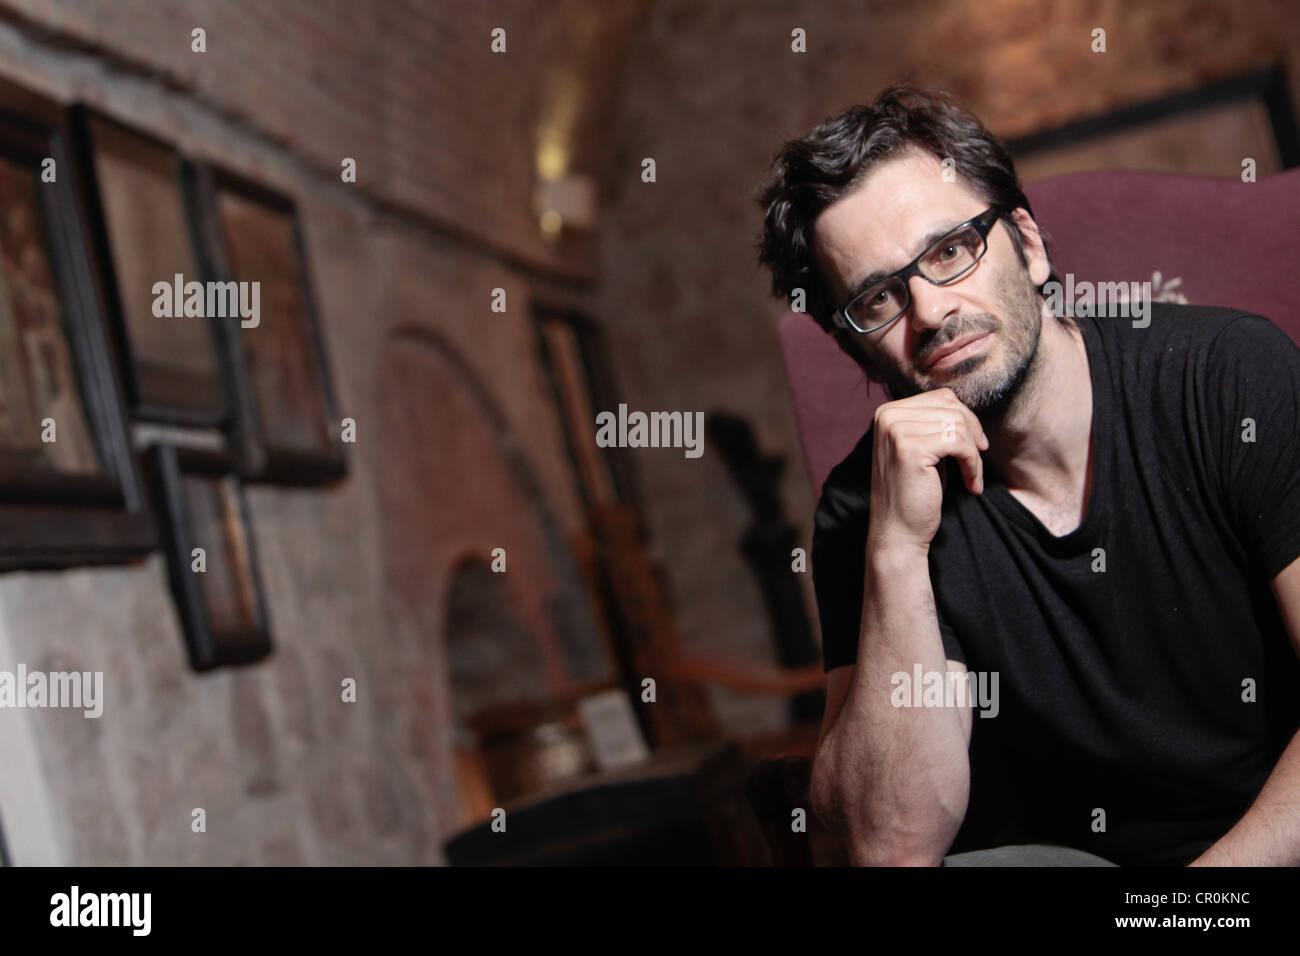 German  freelance journalist and writer Nicol Ljubić with Croatian origin. - Stock Image